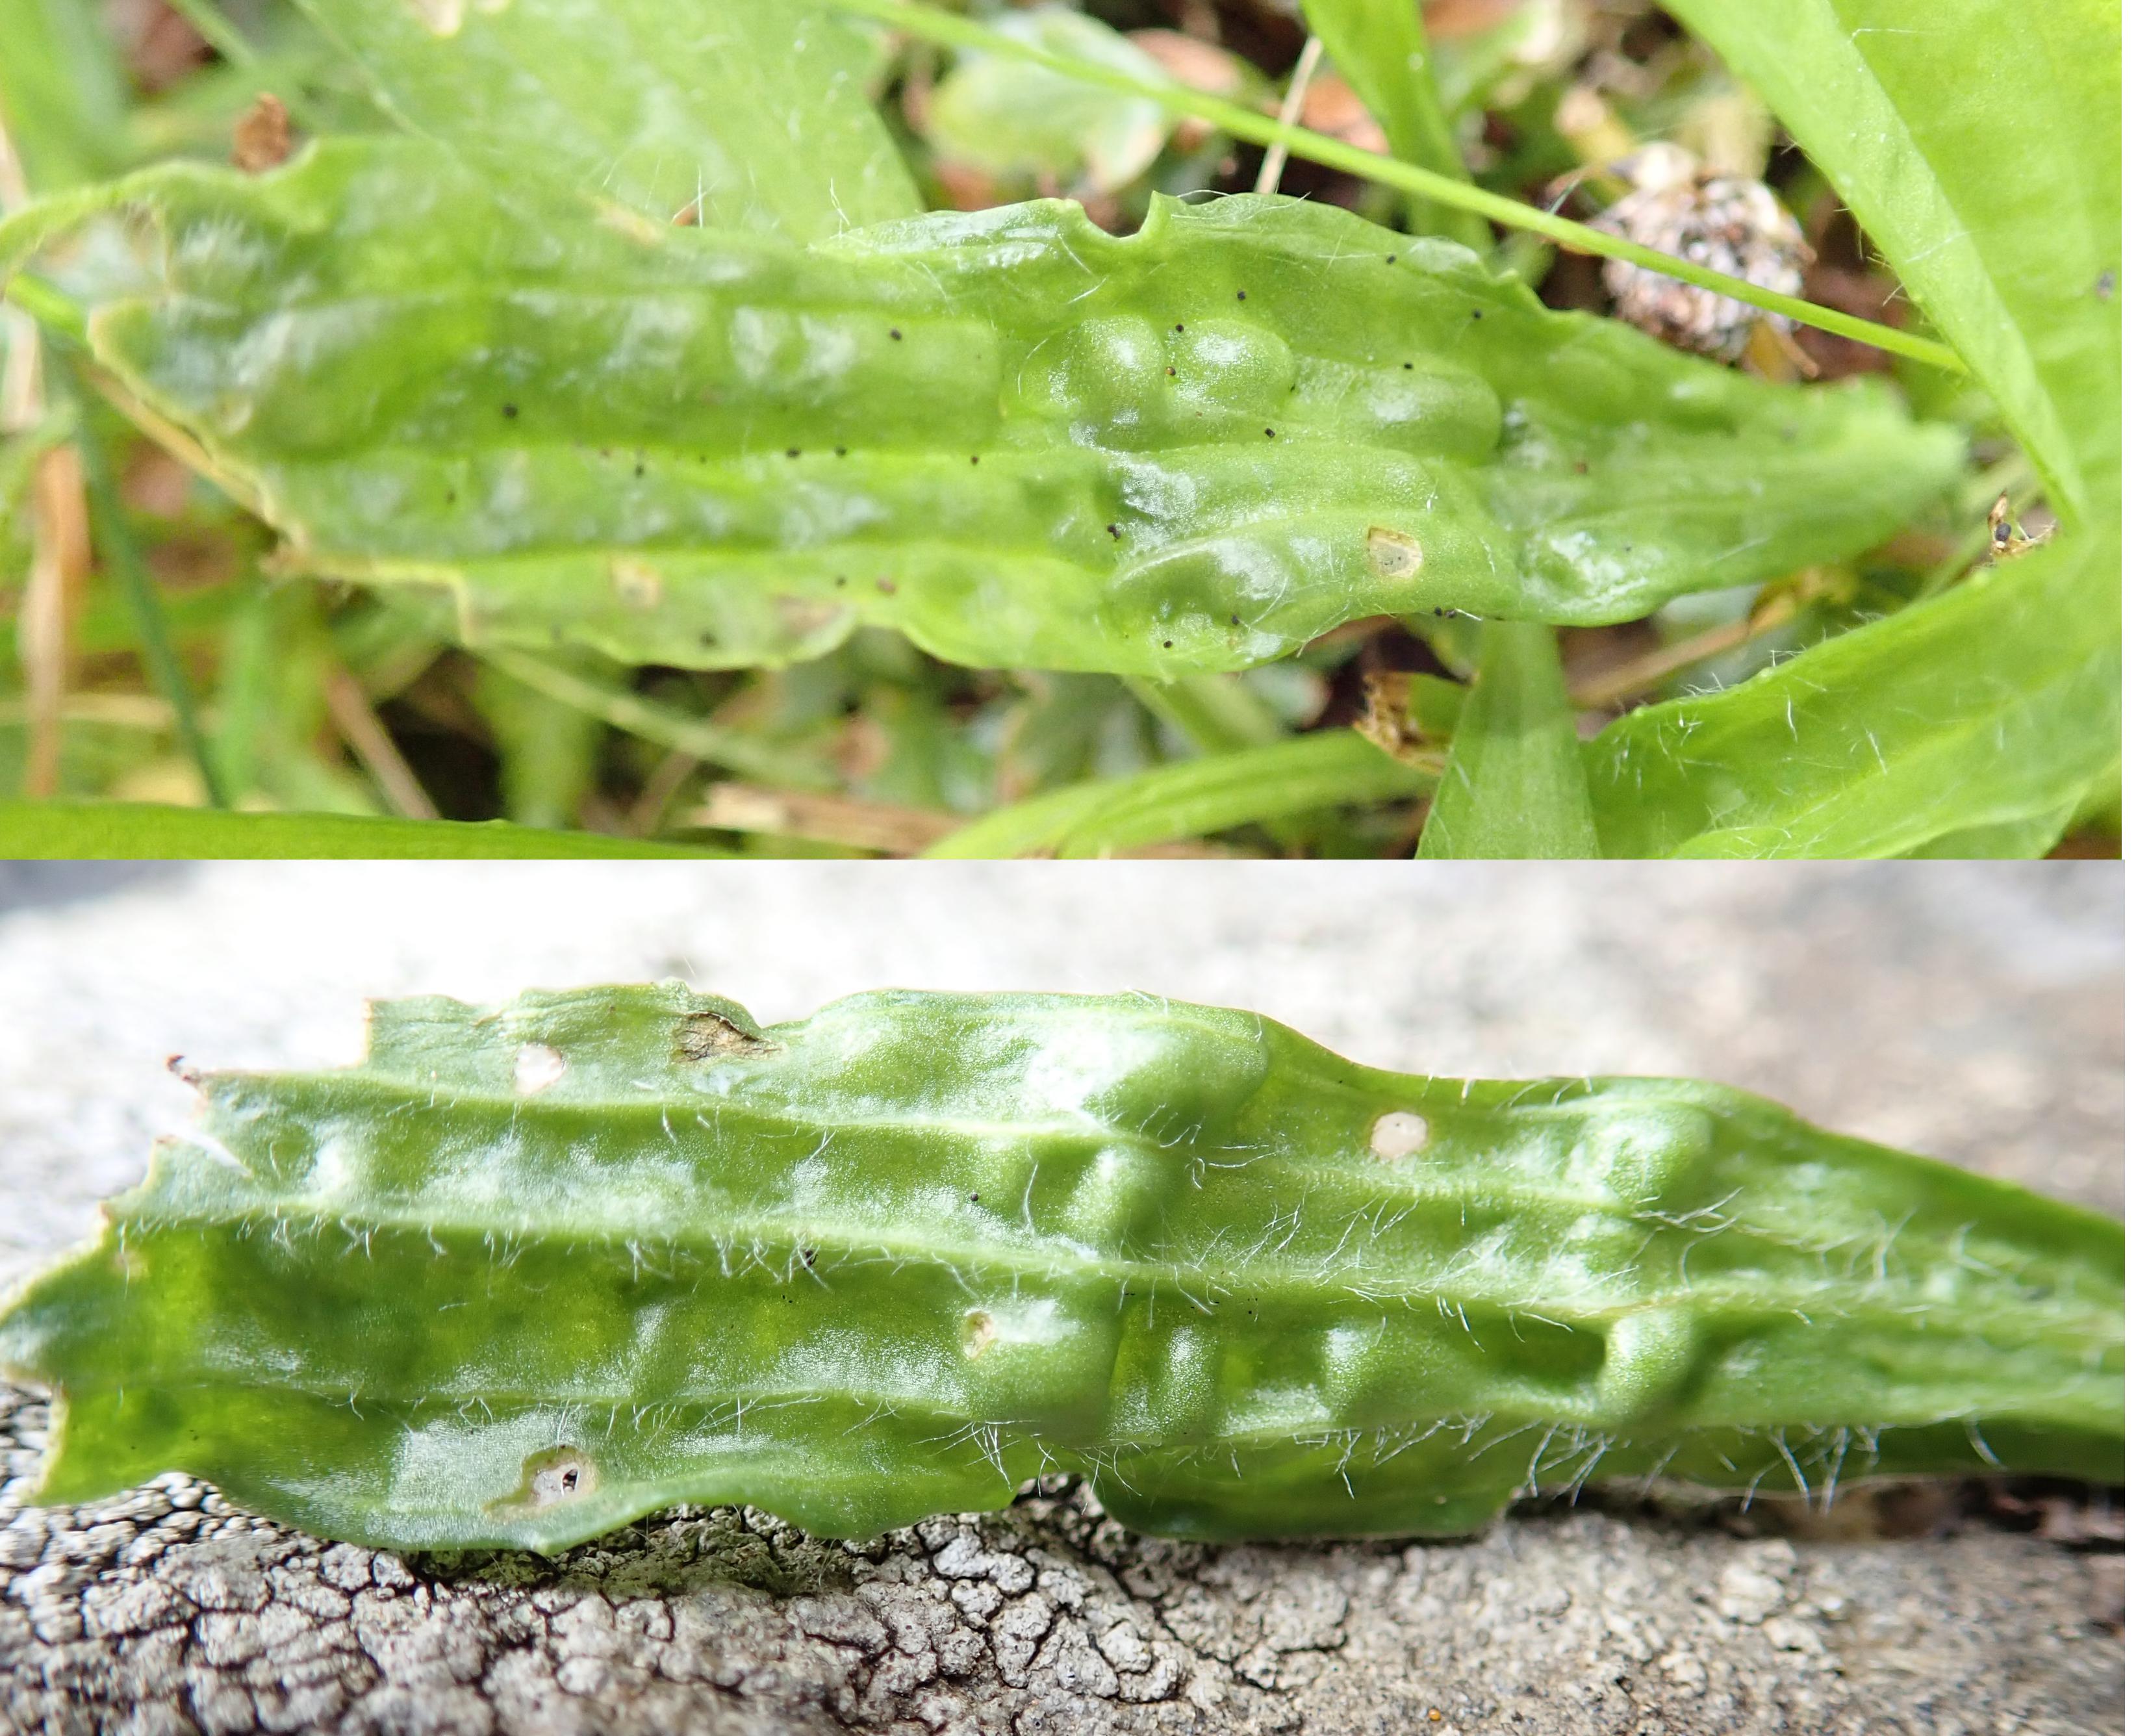 Plantago lanceolata nematode gall